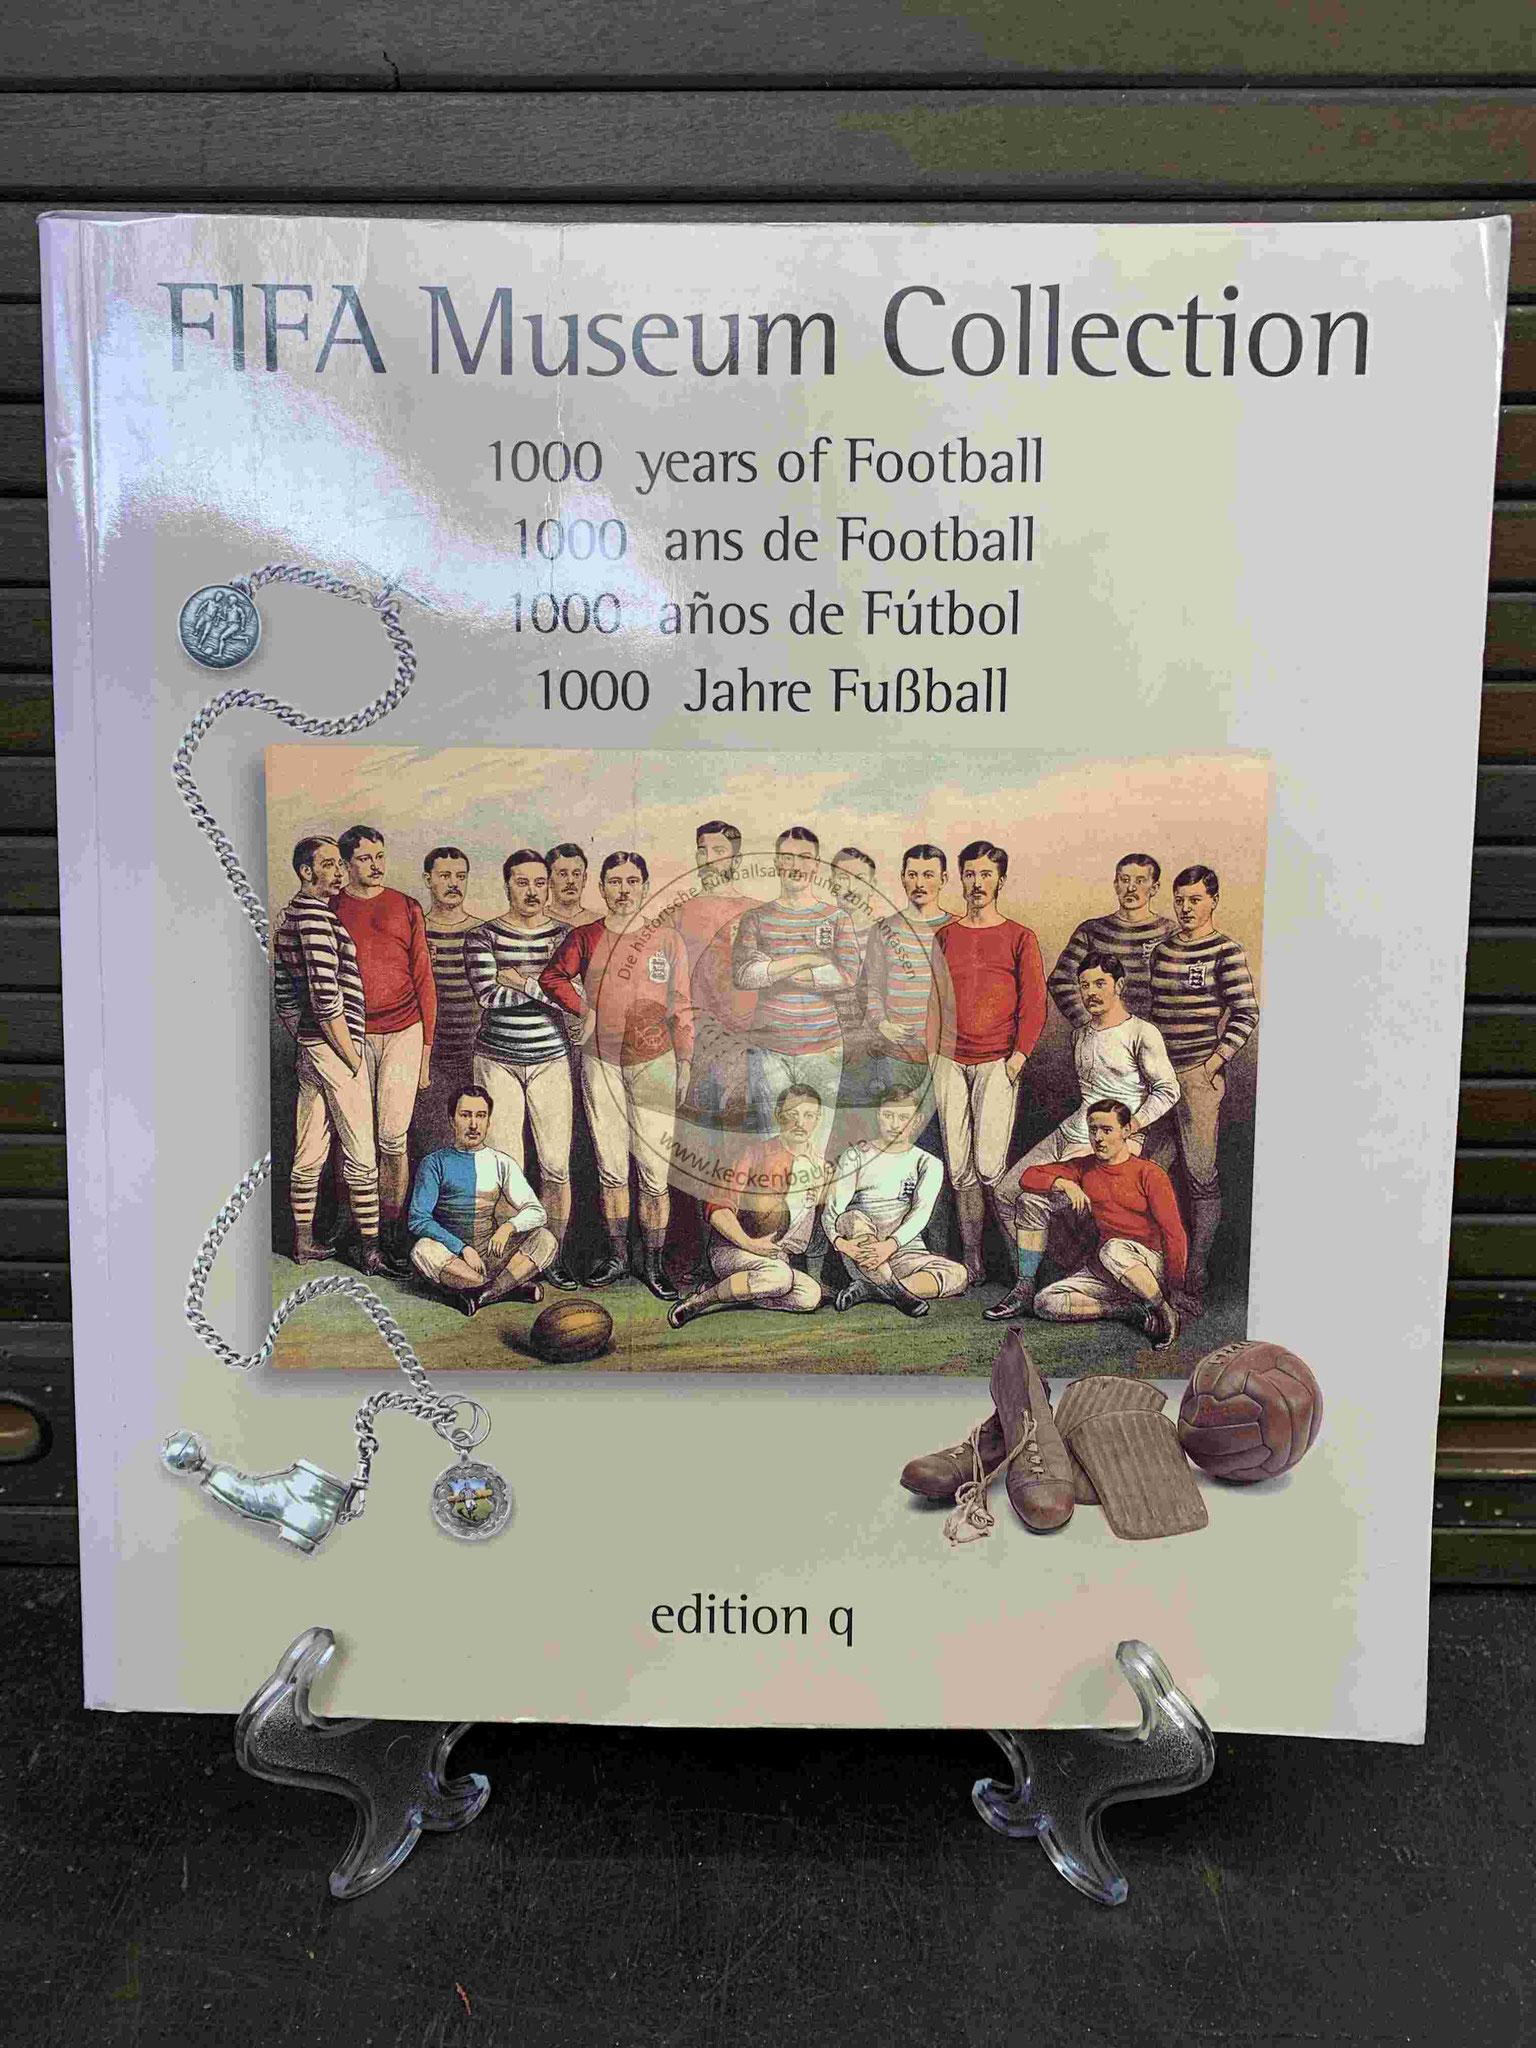 FIFA Museum Collection edition aus dem Jahr 1996